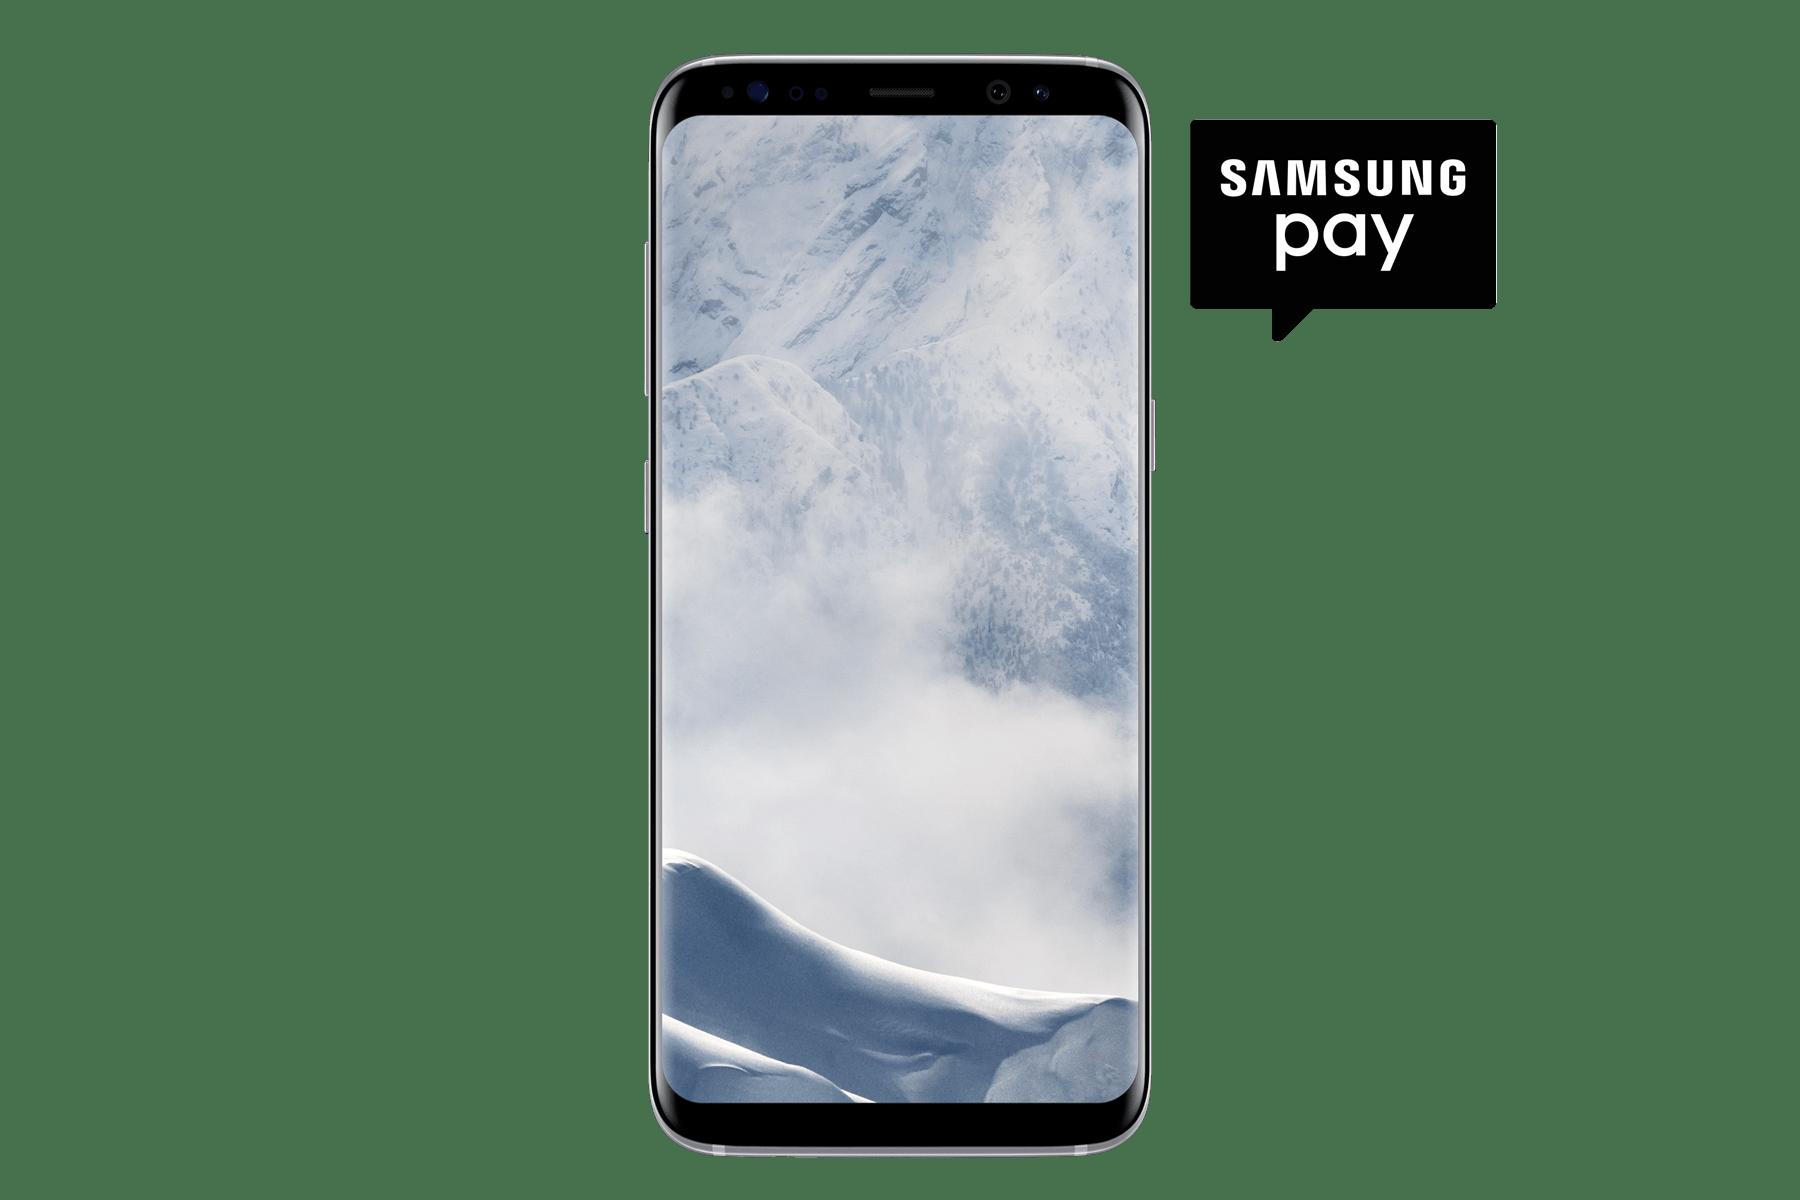 Samsung Galaxy S8 batteri laddas inte längre Hjälp